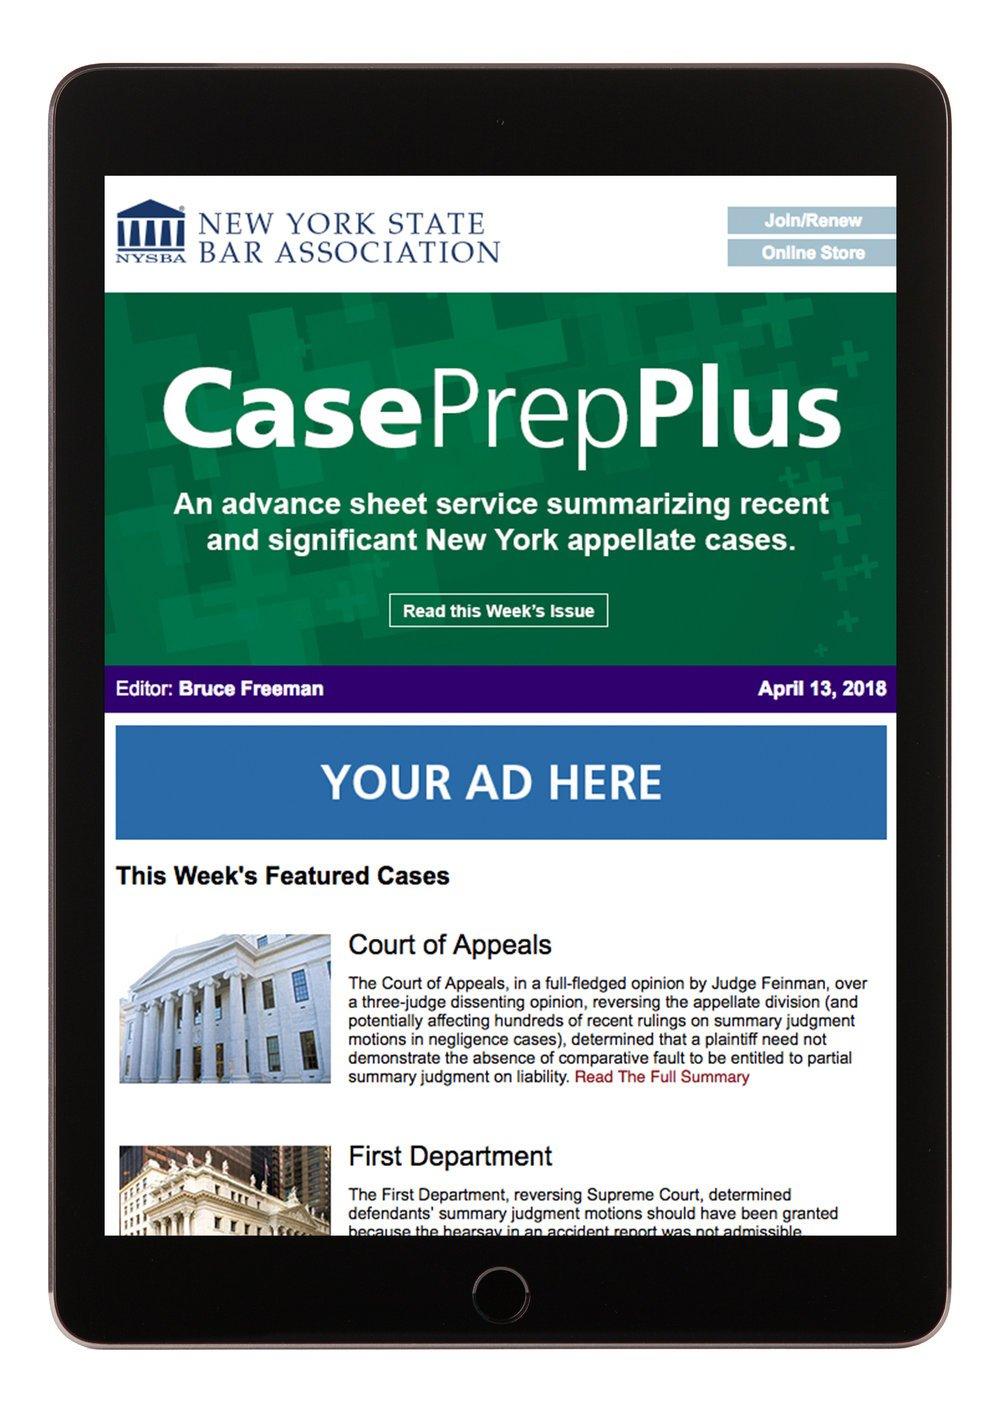 Member Benefits_Legal Research and Alerts_CasePrepPlus